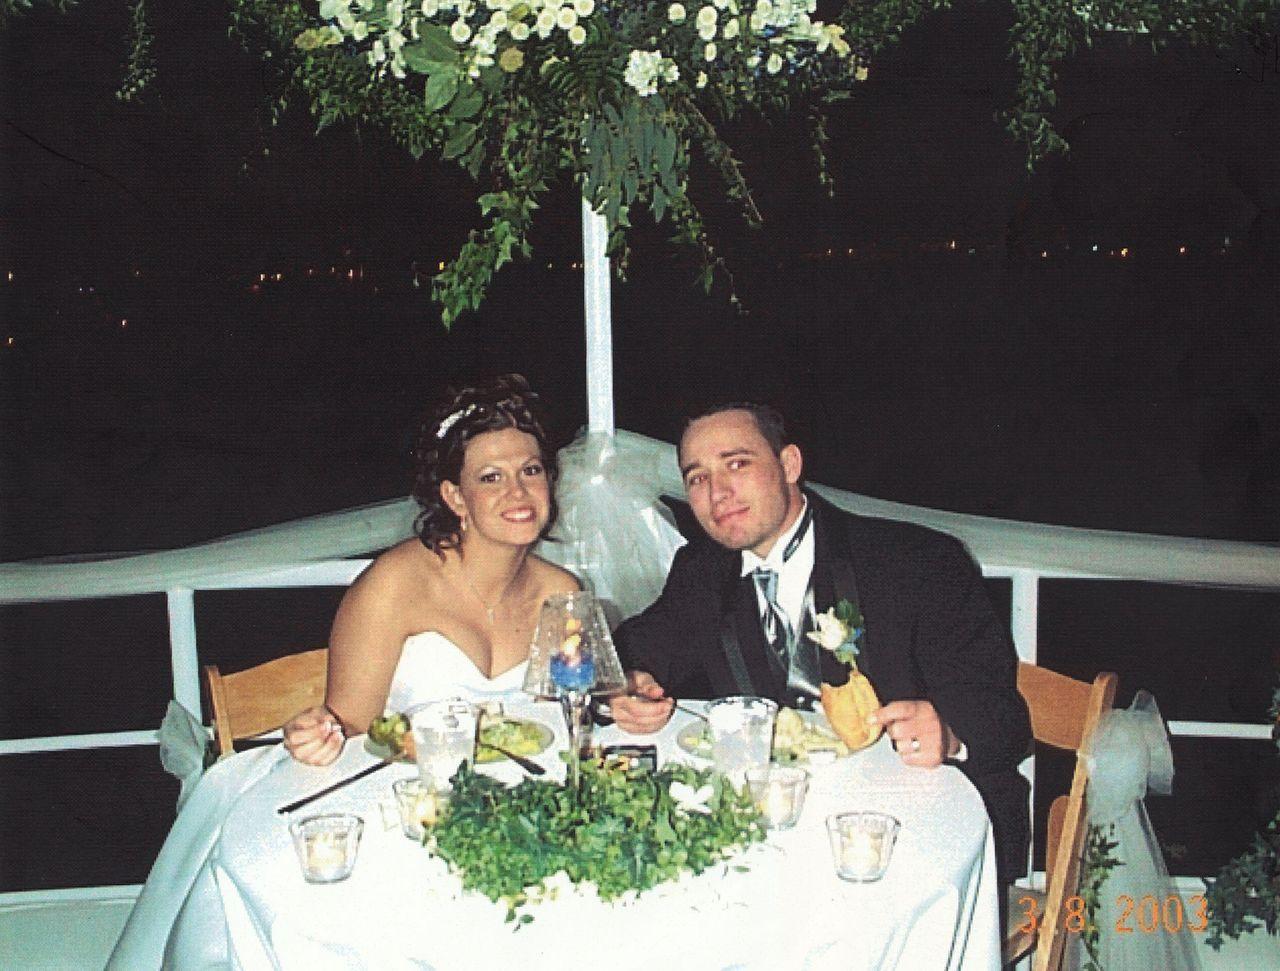 Killer Couples Mörderische Paare Yacht Geld Sixx